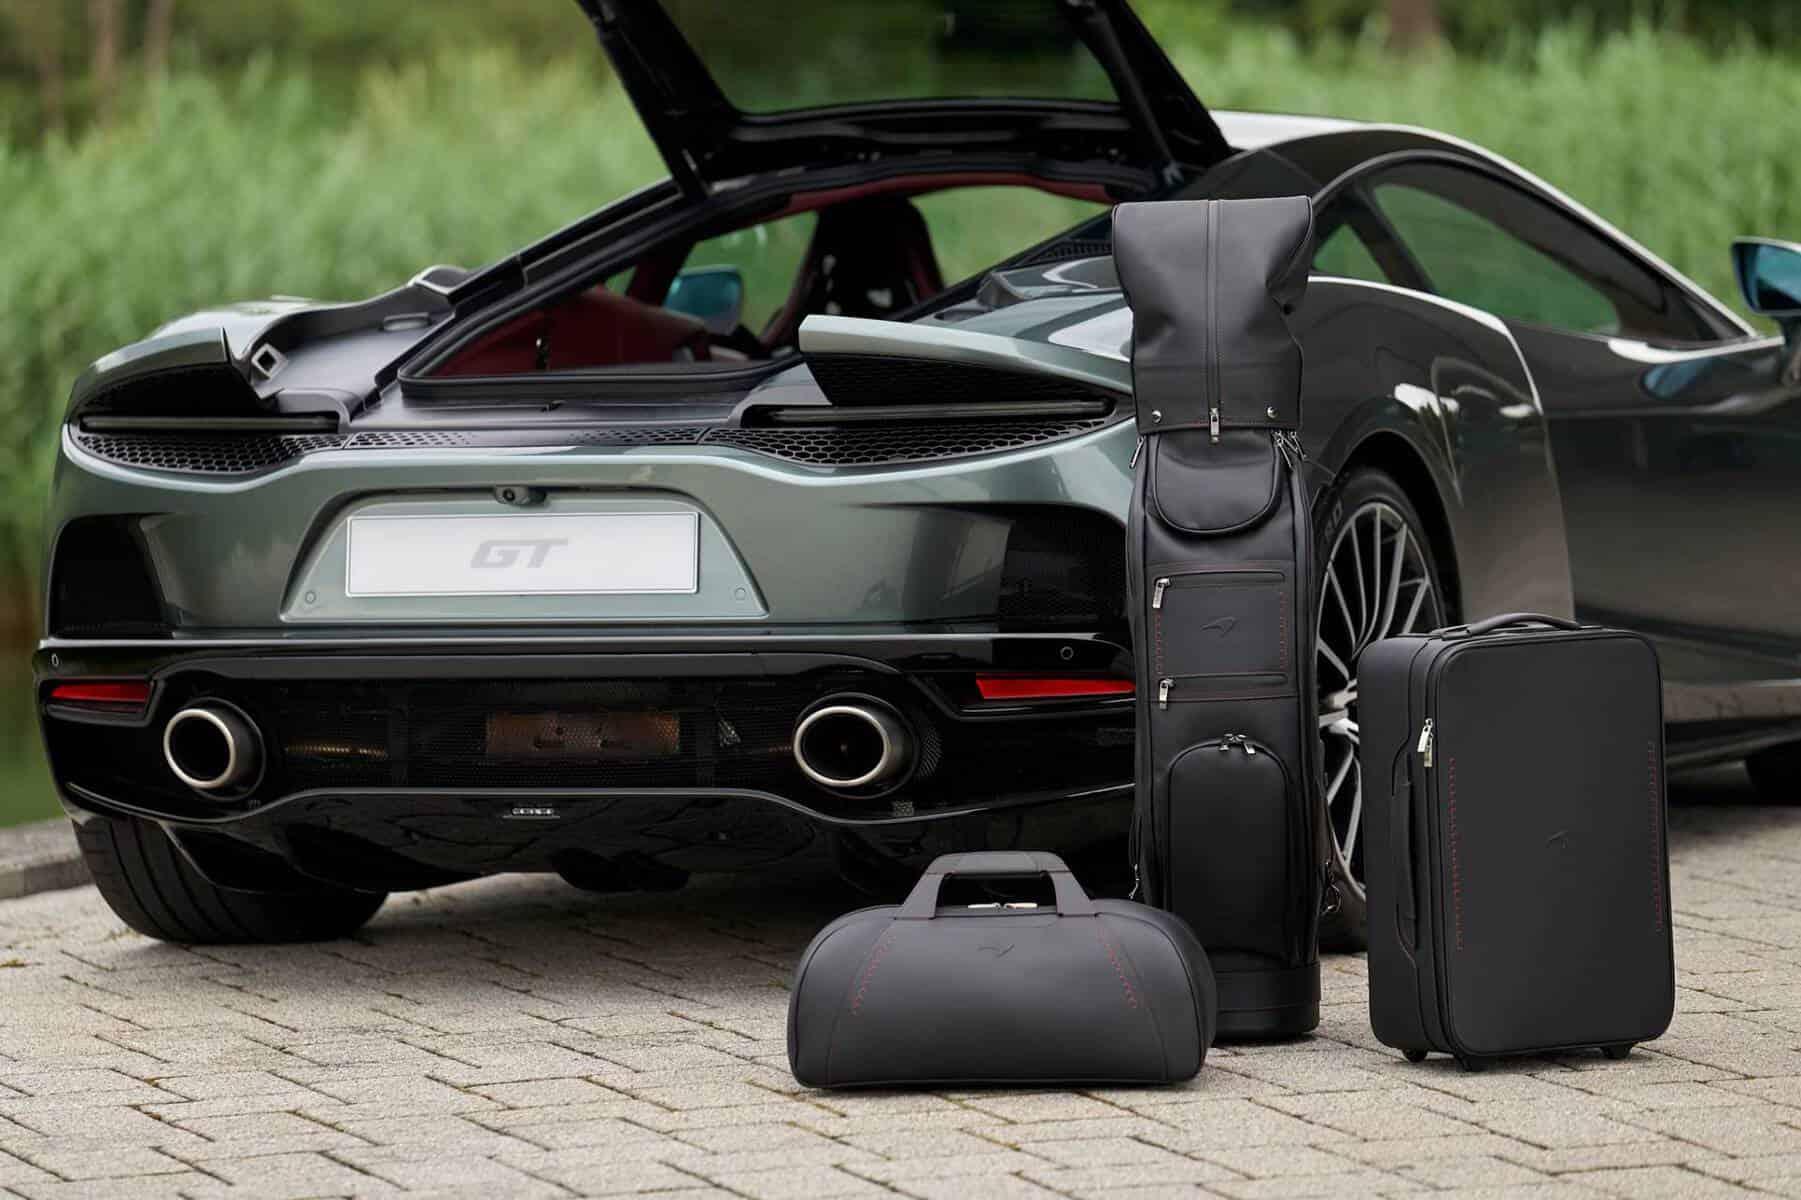 mclaren gt luggage set 5